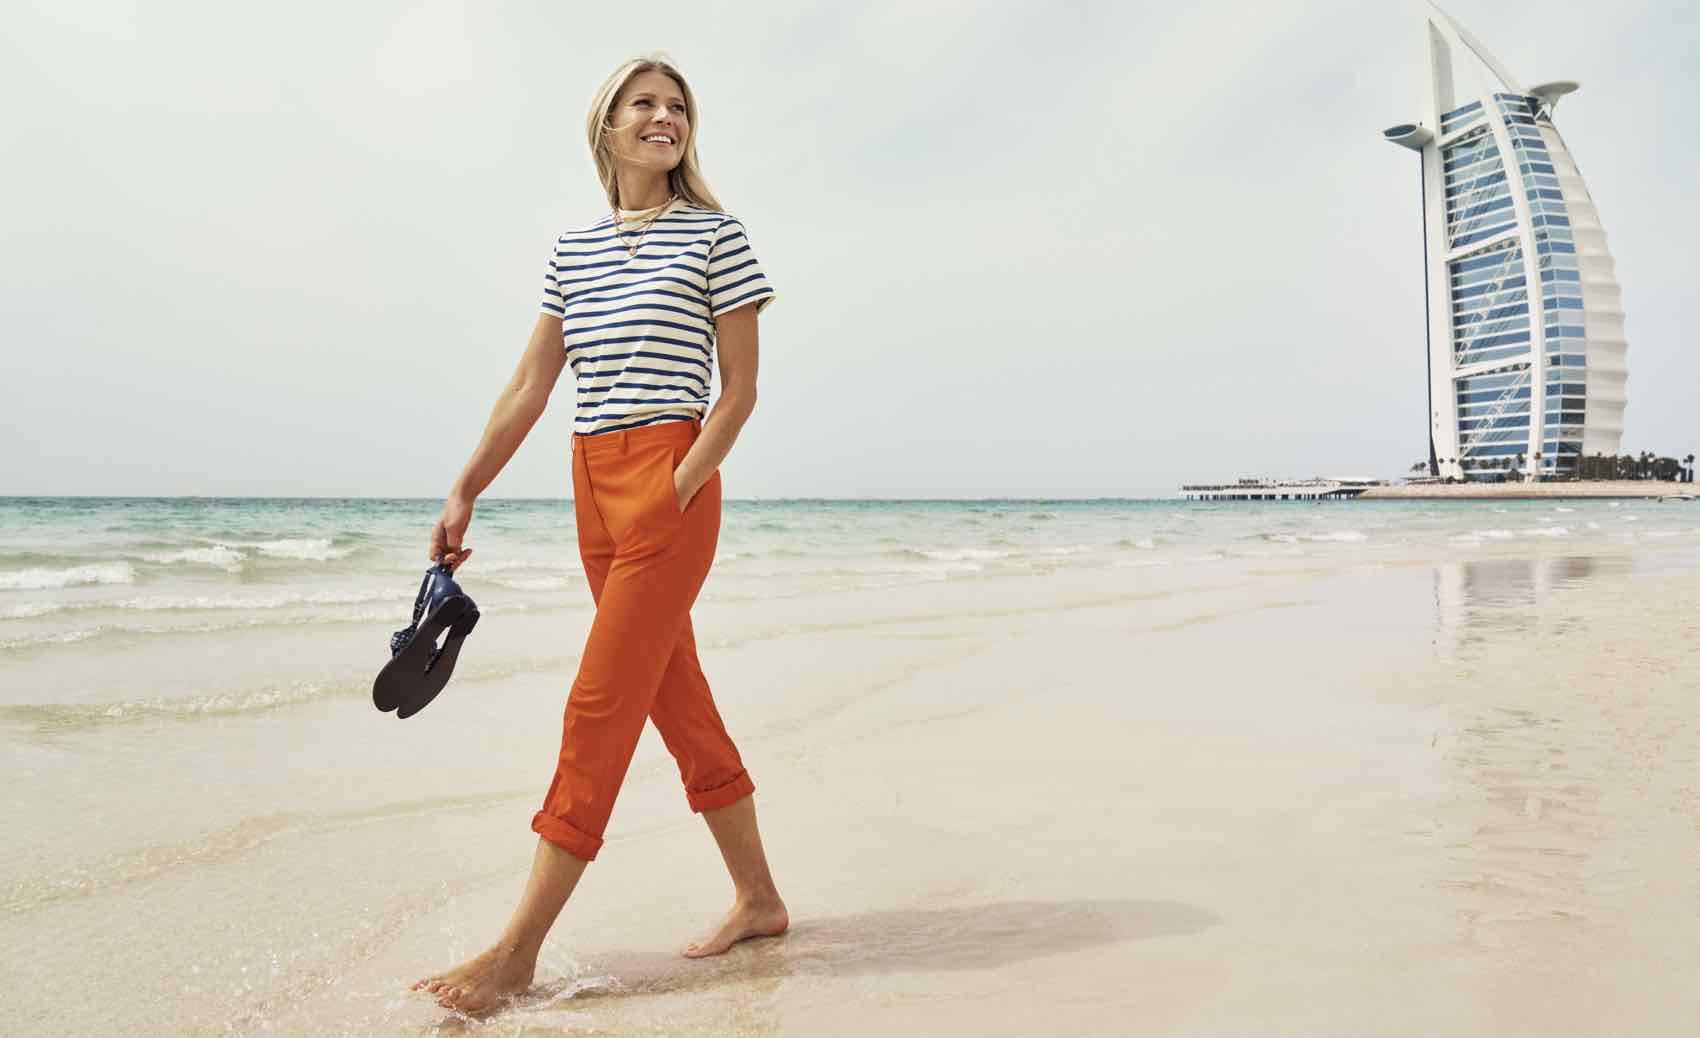 Walk on the Jumeirah Beach in Dubai, perfect for winter sun